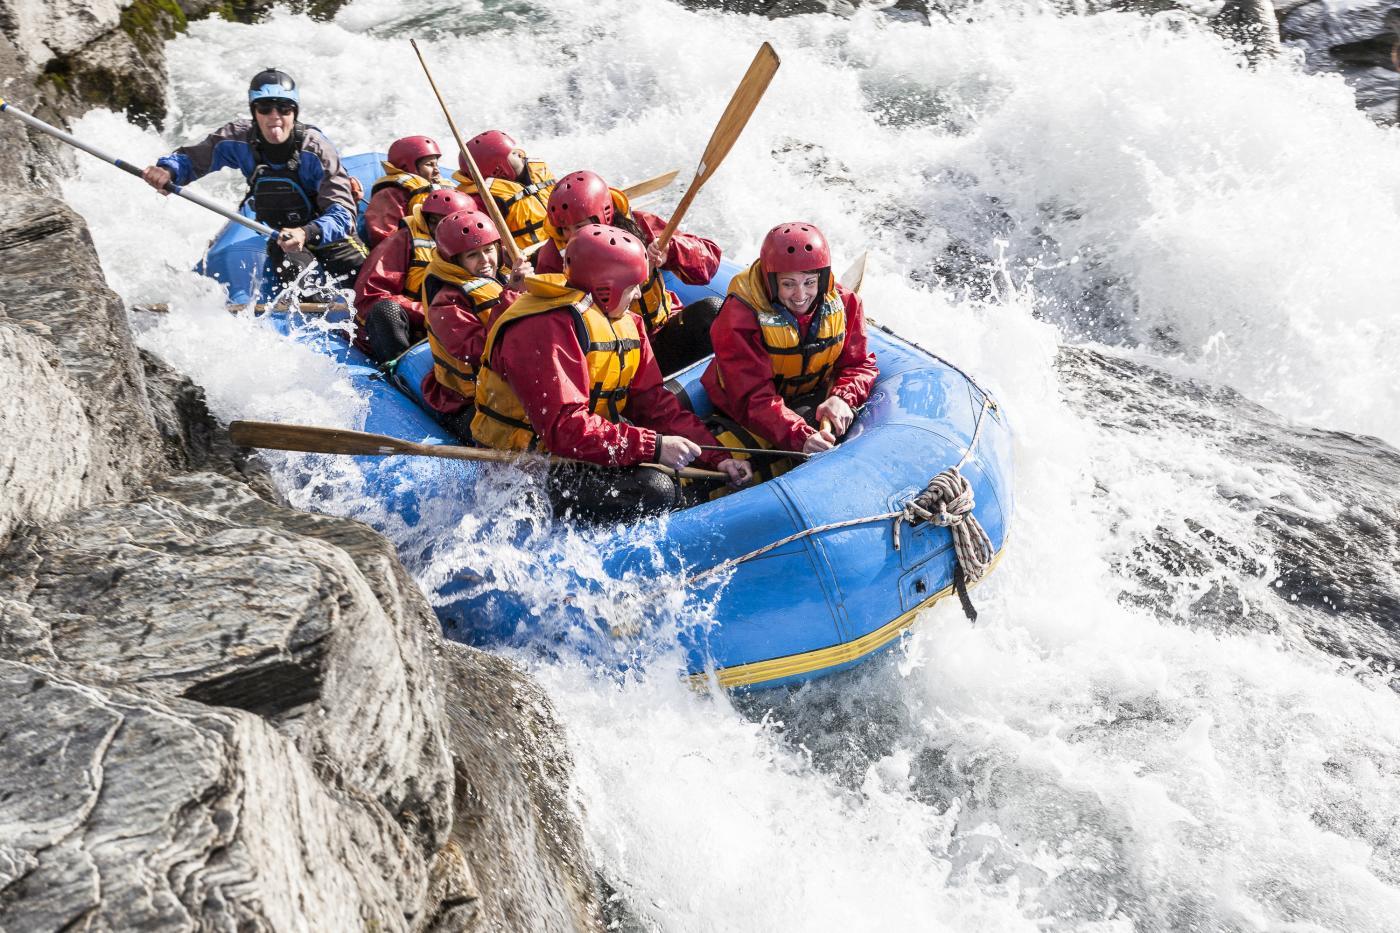 Rafting boat through white water rapids